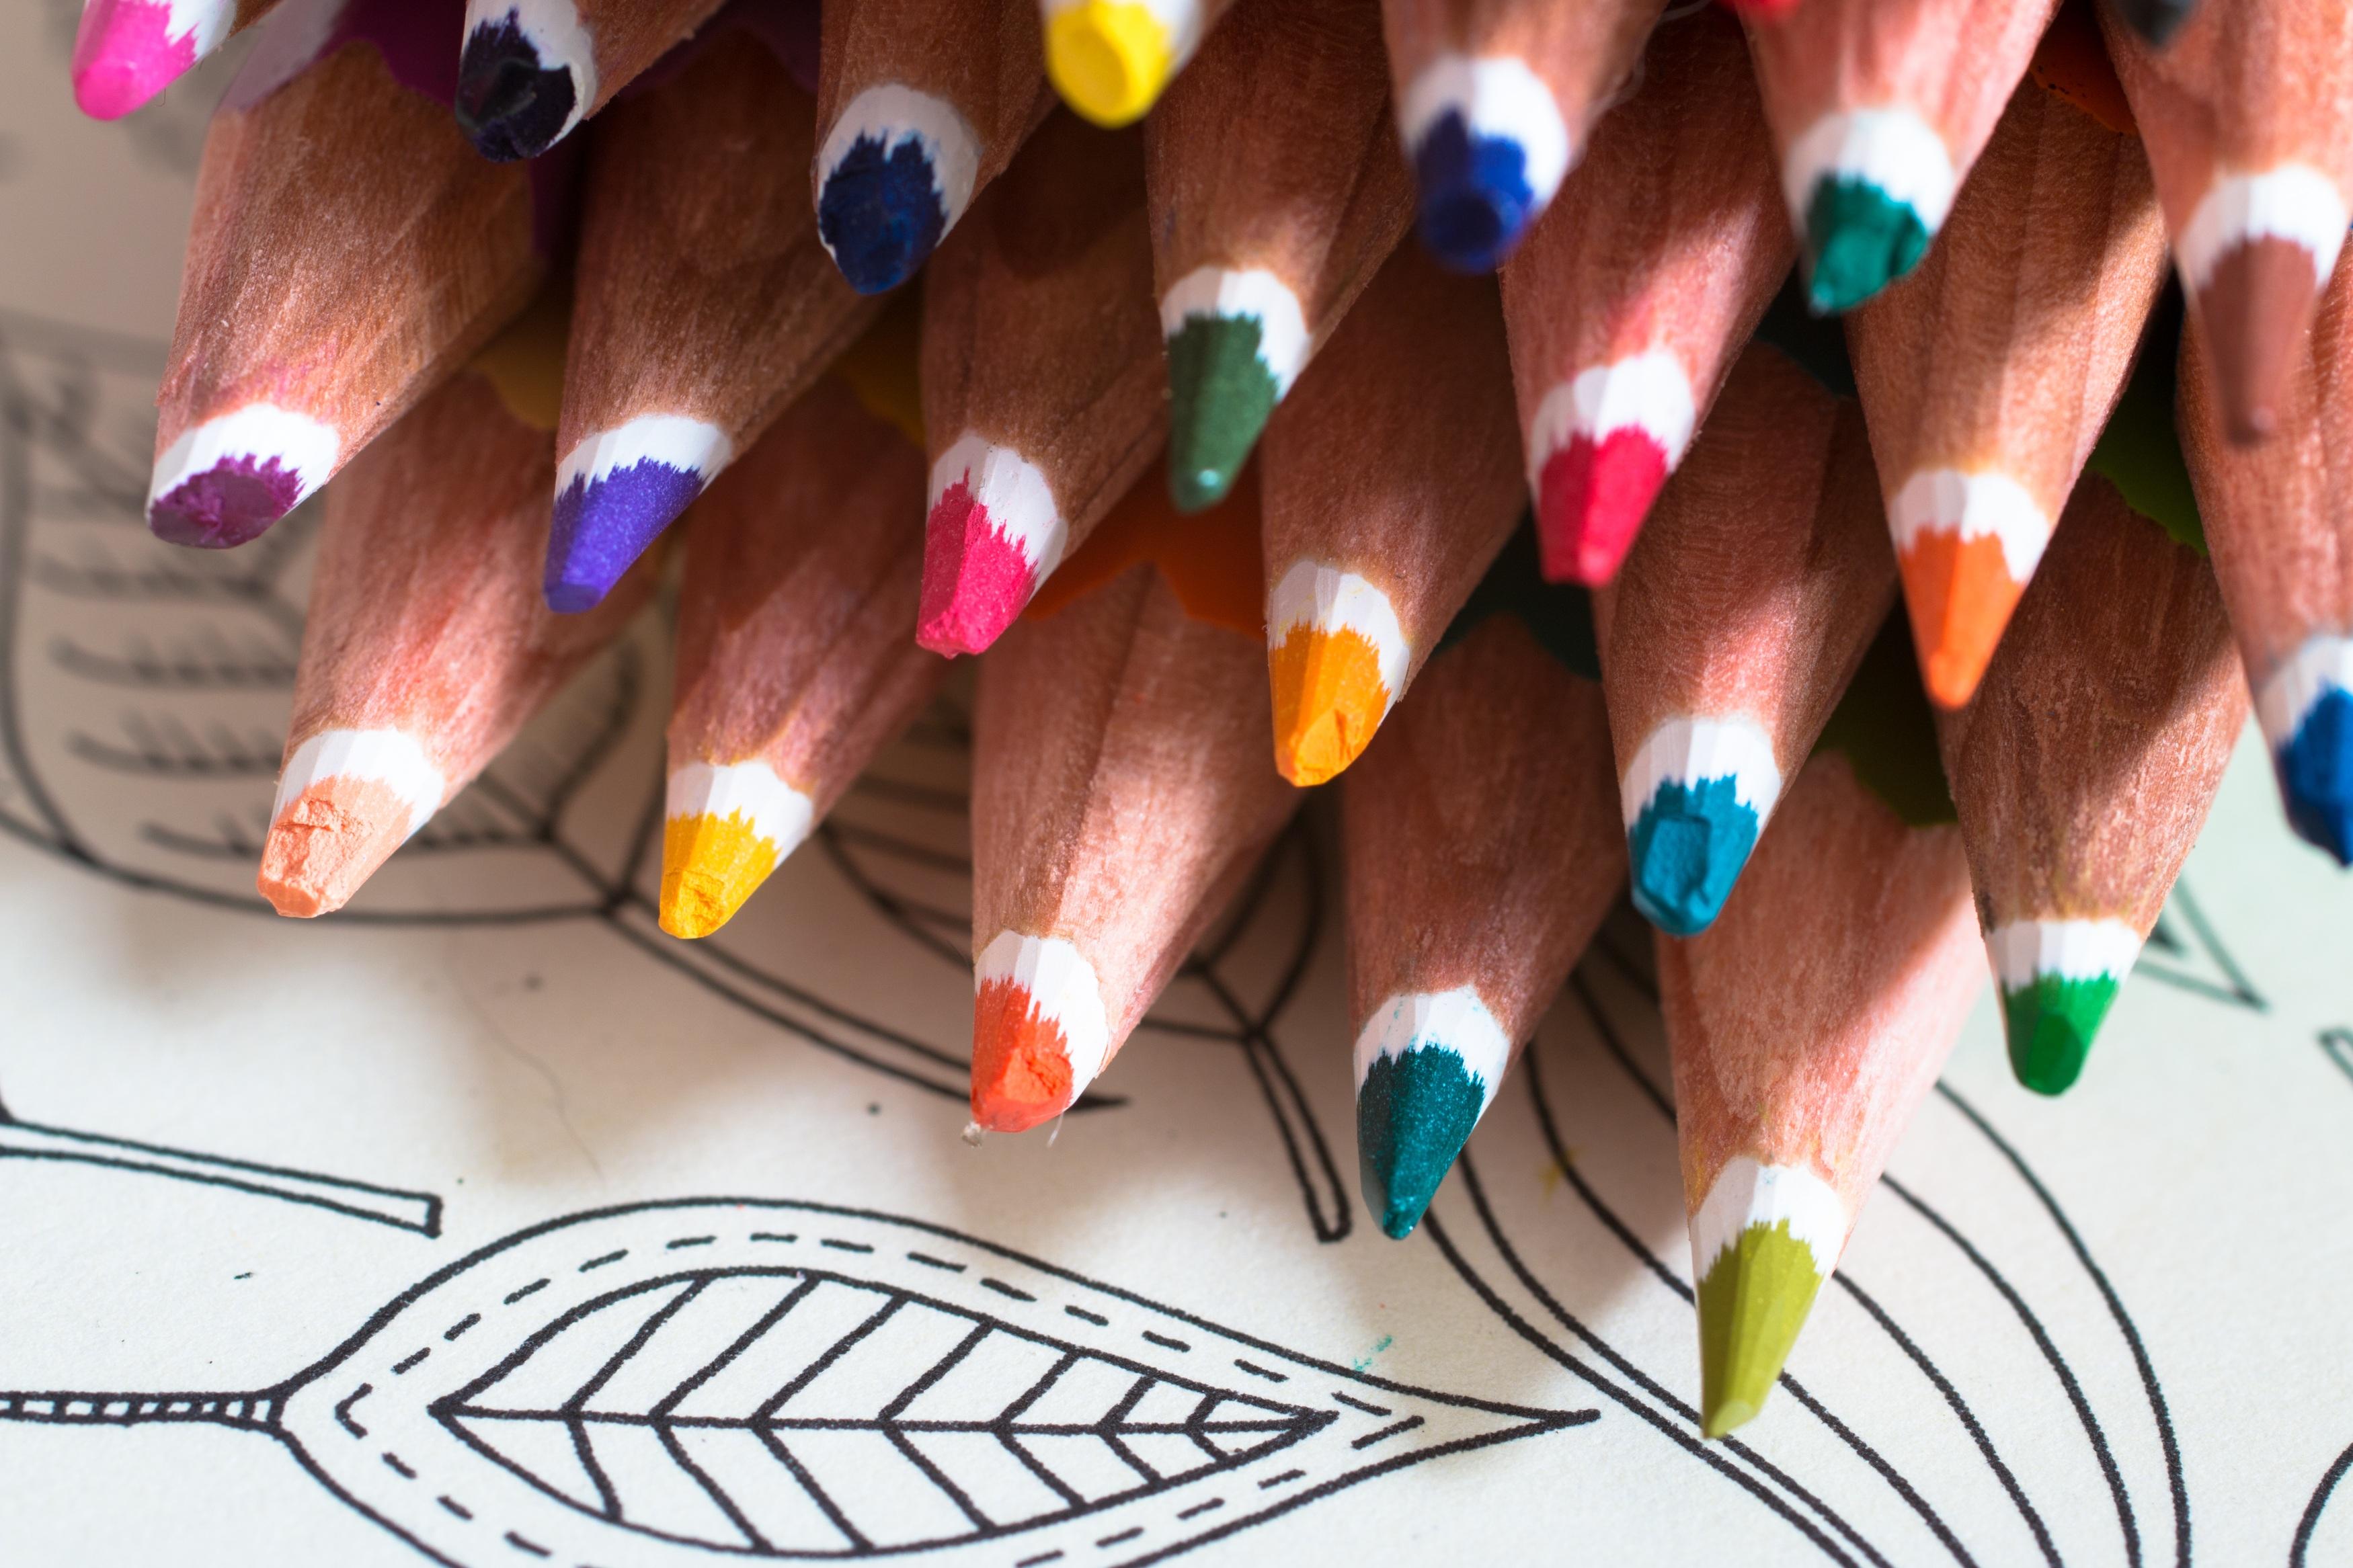 tangan pensil kreatif pola jari warna cat kuku lukisan orang dewasa meditasi pulpen menenangkan pensil warna